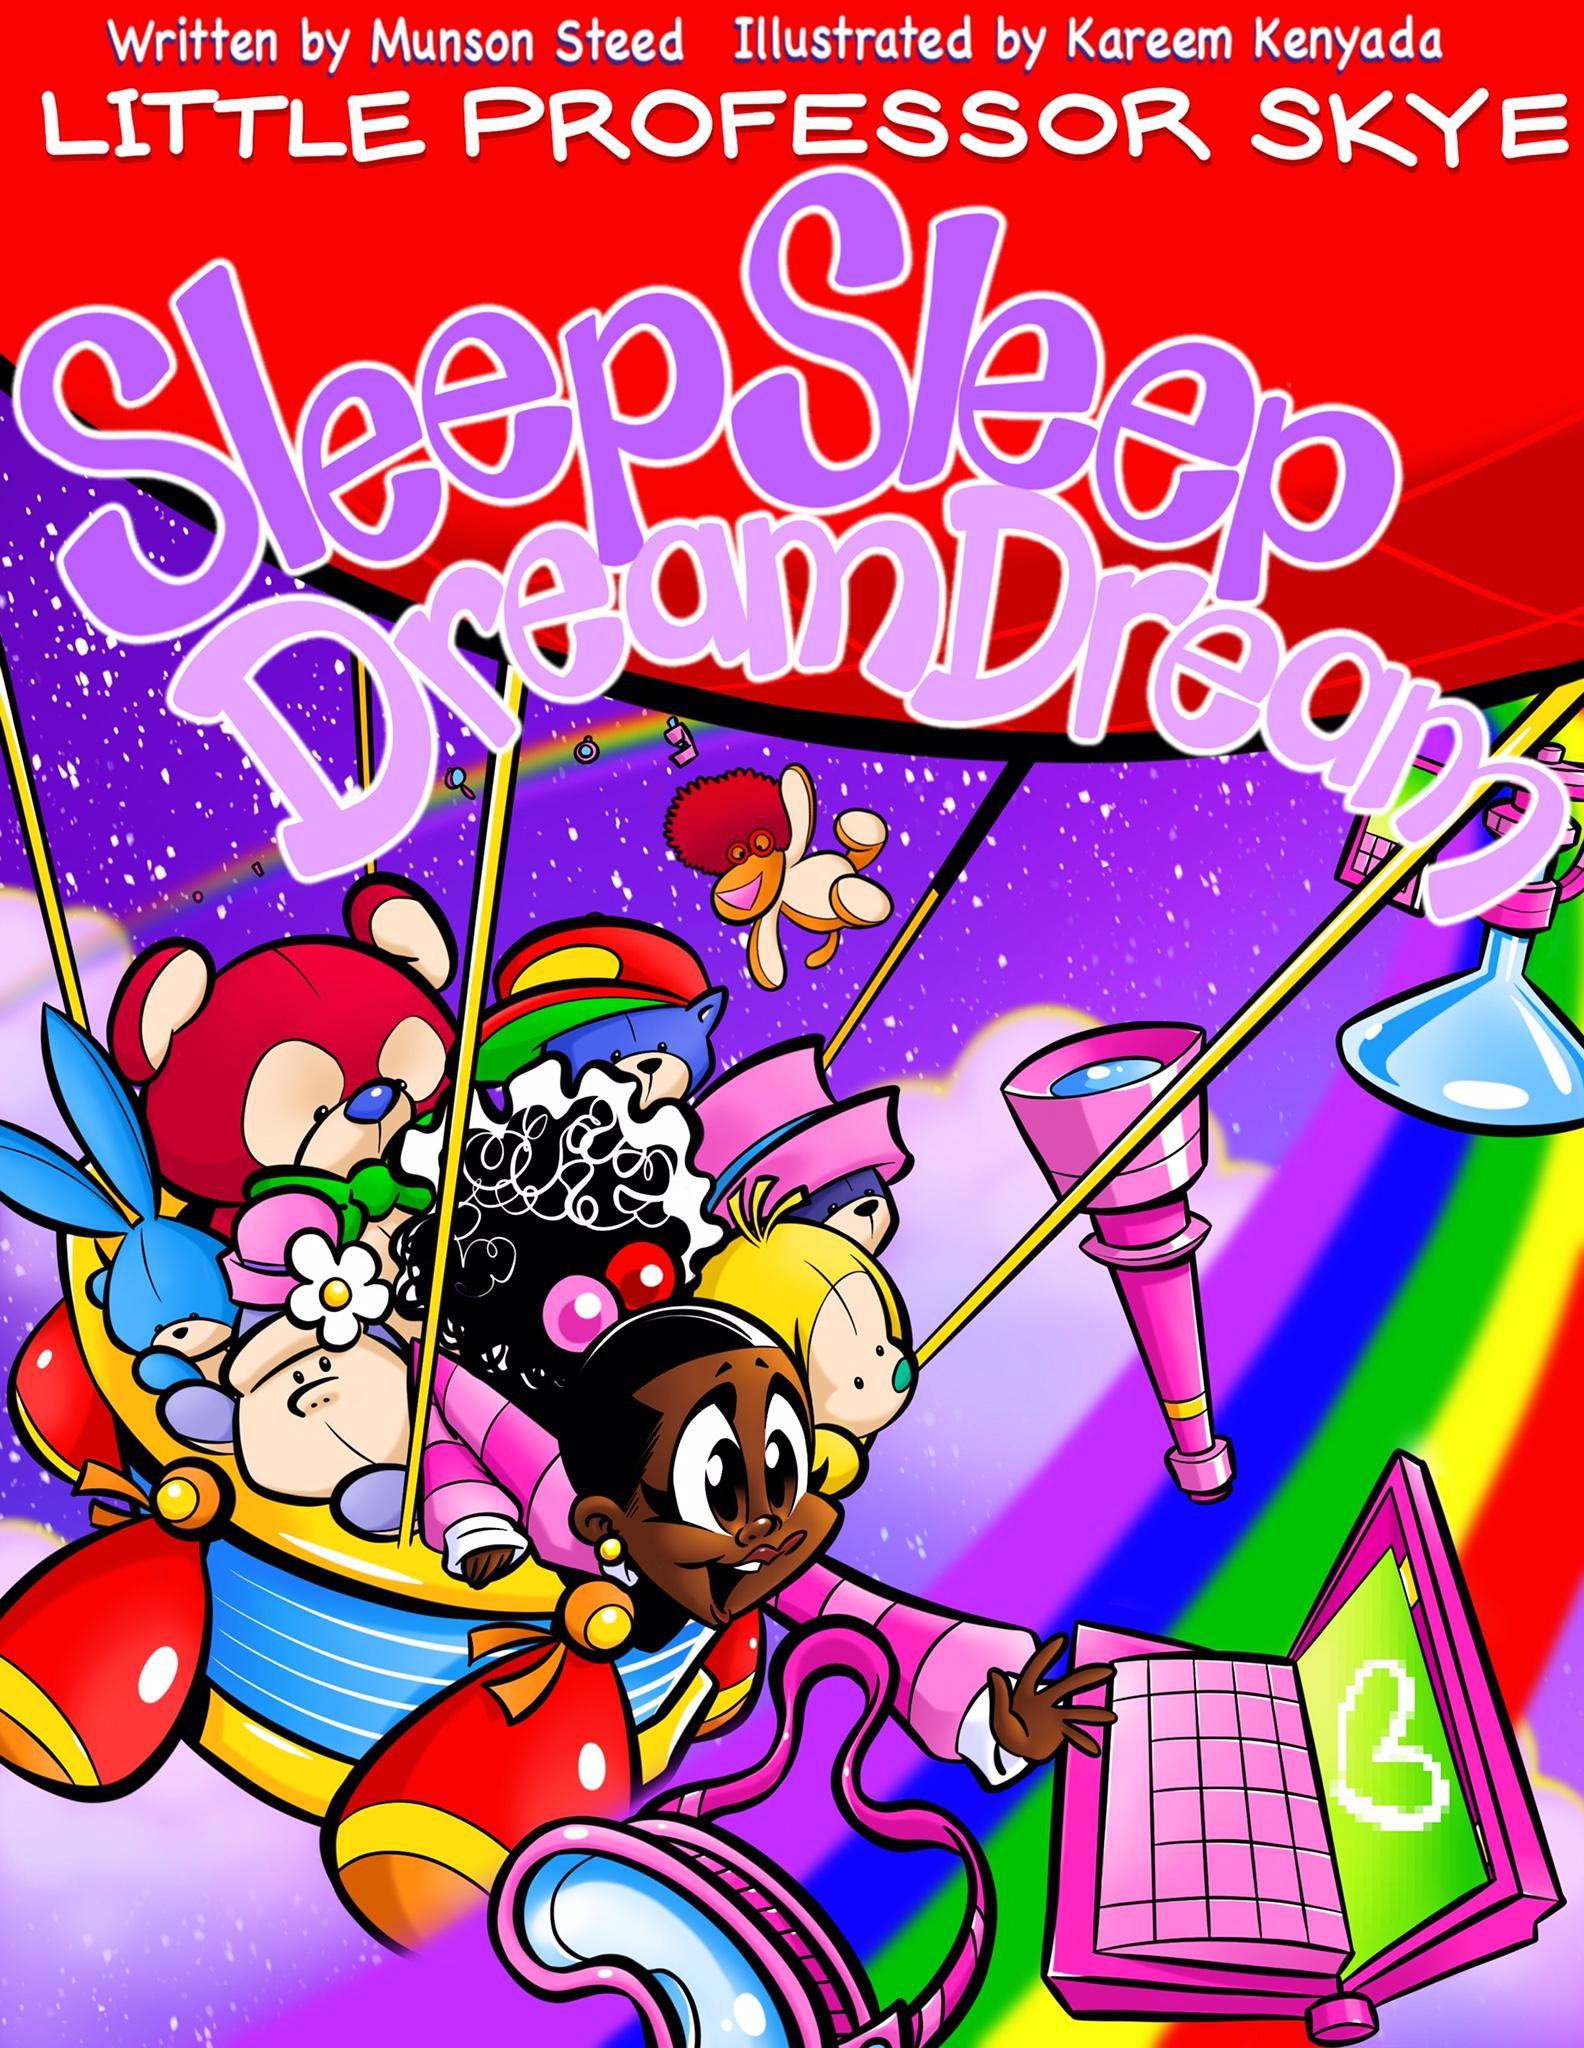 Munson Steed Releases New Children's Book, Little Professor Skye Series: Sleep Sleep Dream Dream